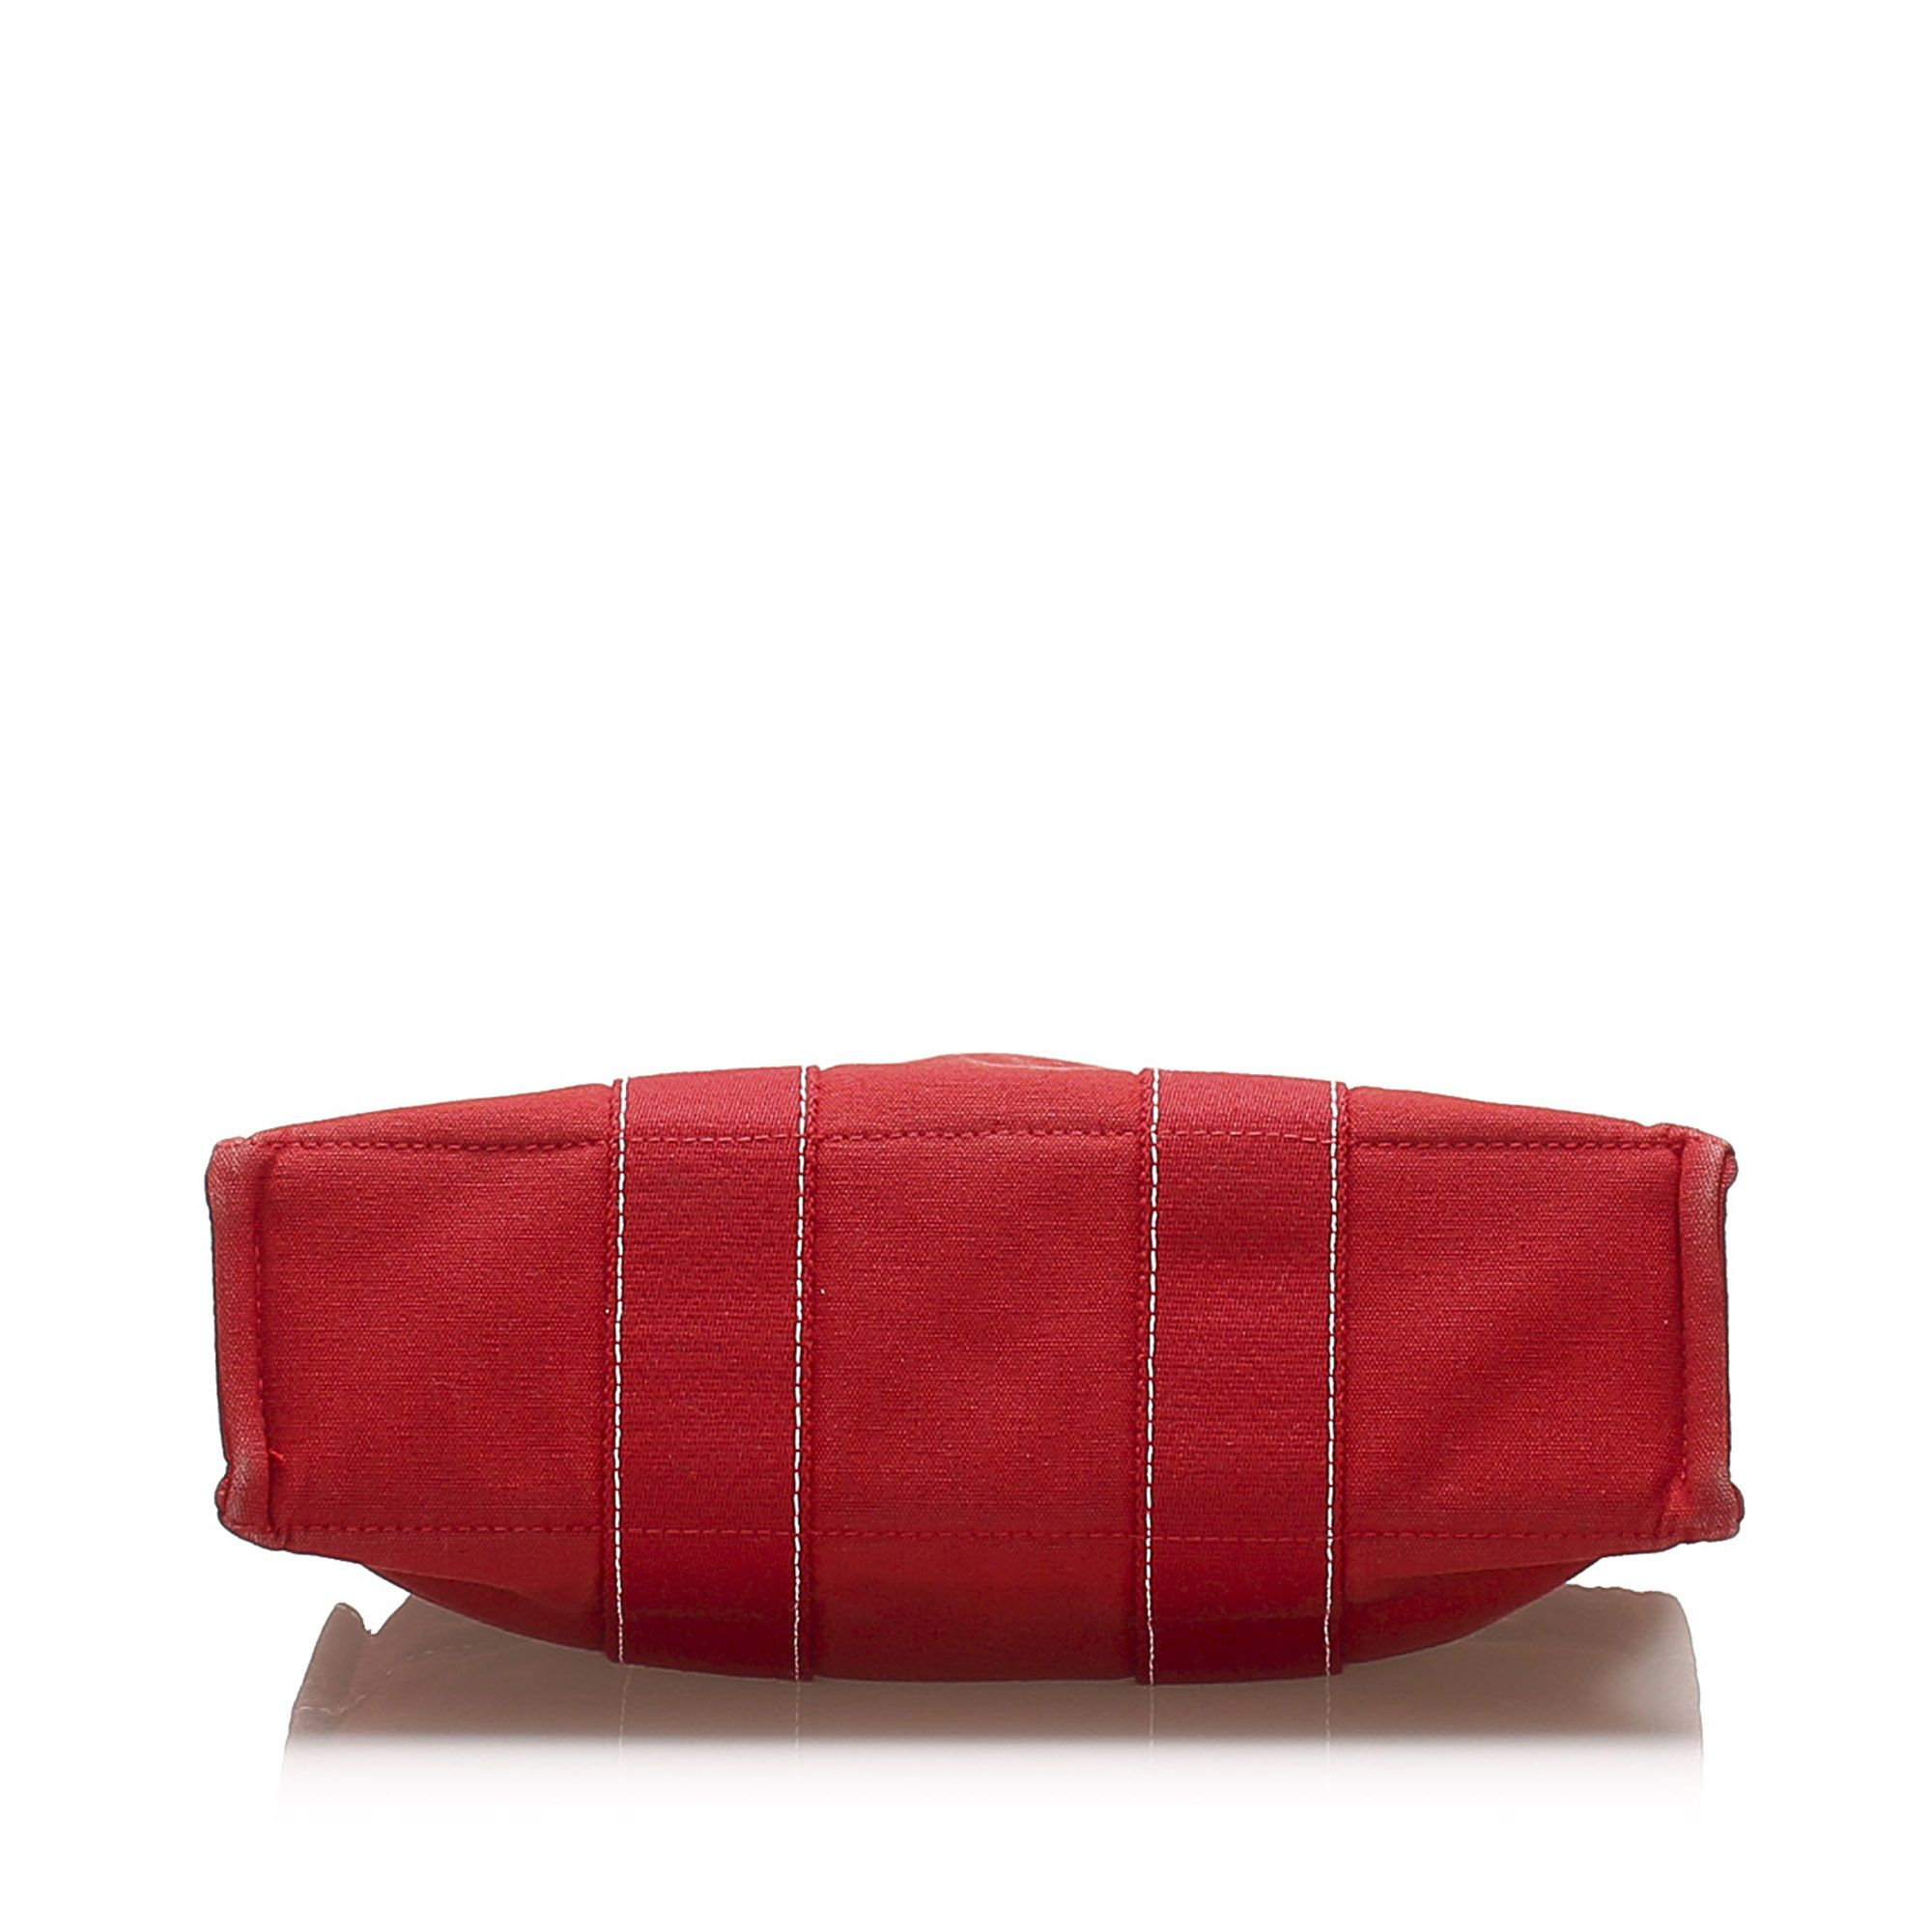 Vintage Hermes Fourre Tout PM Red